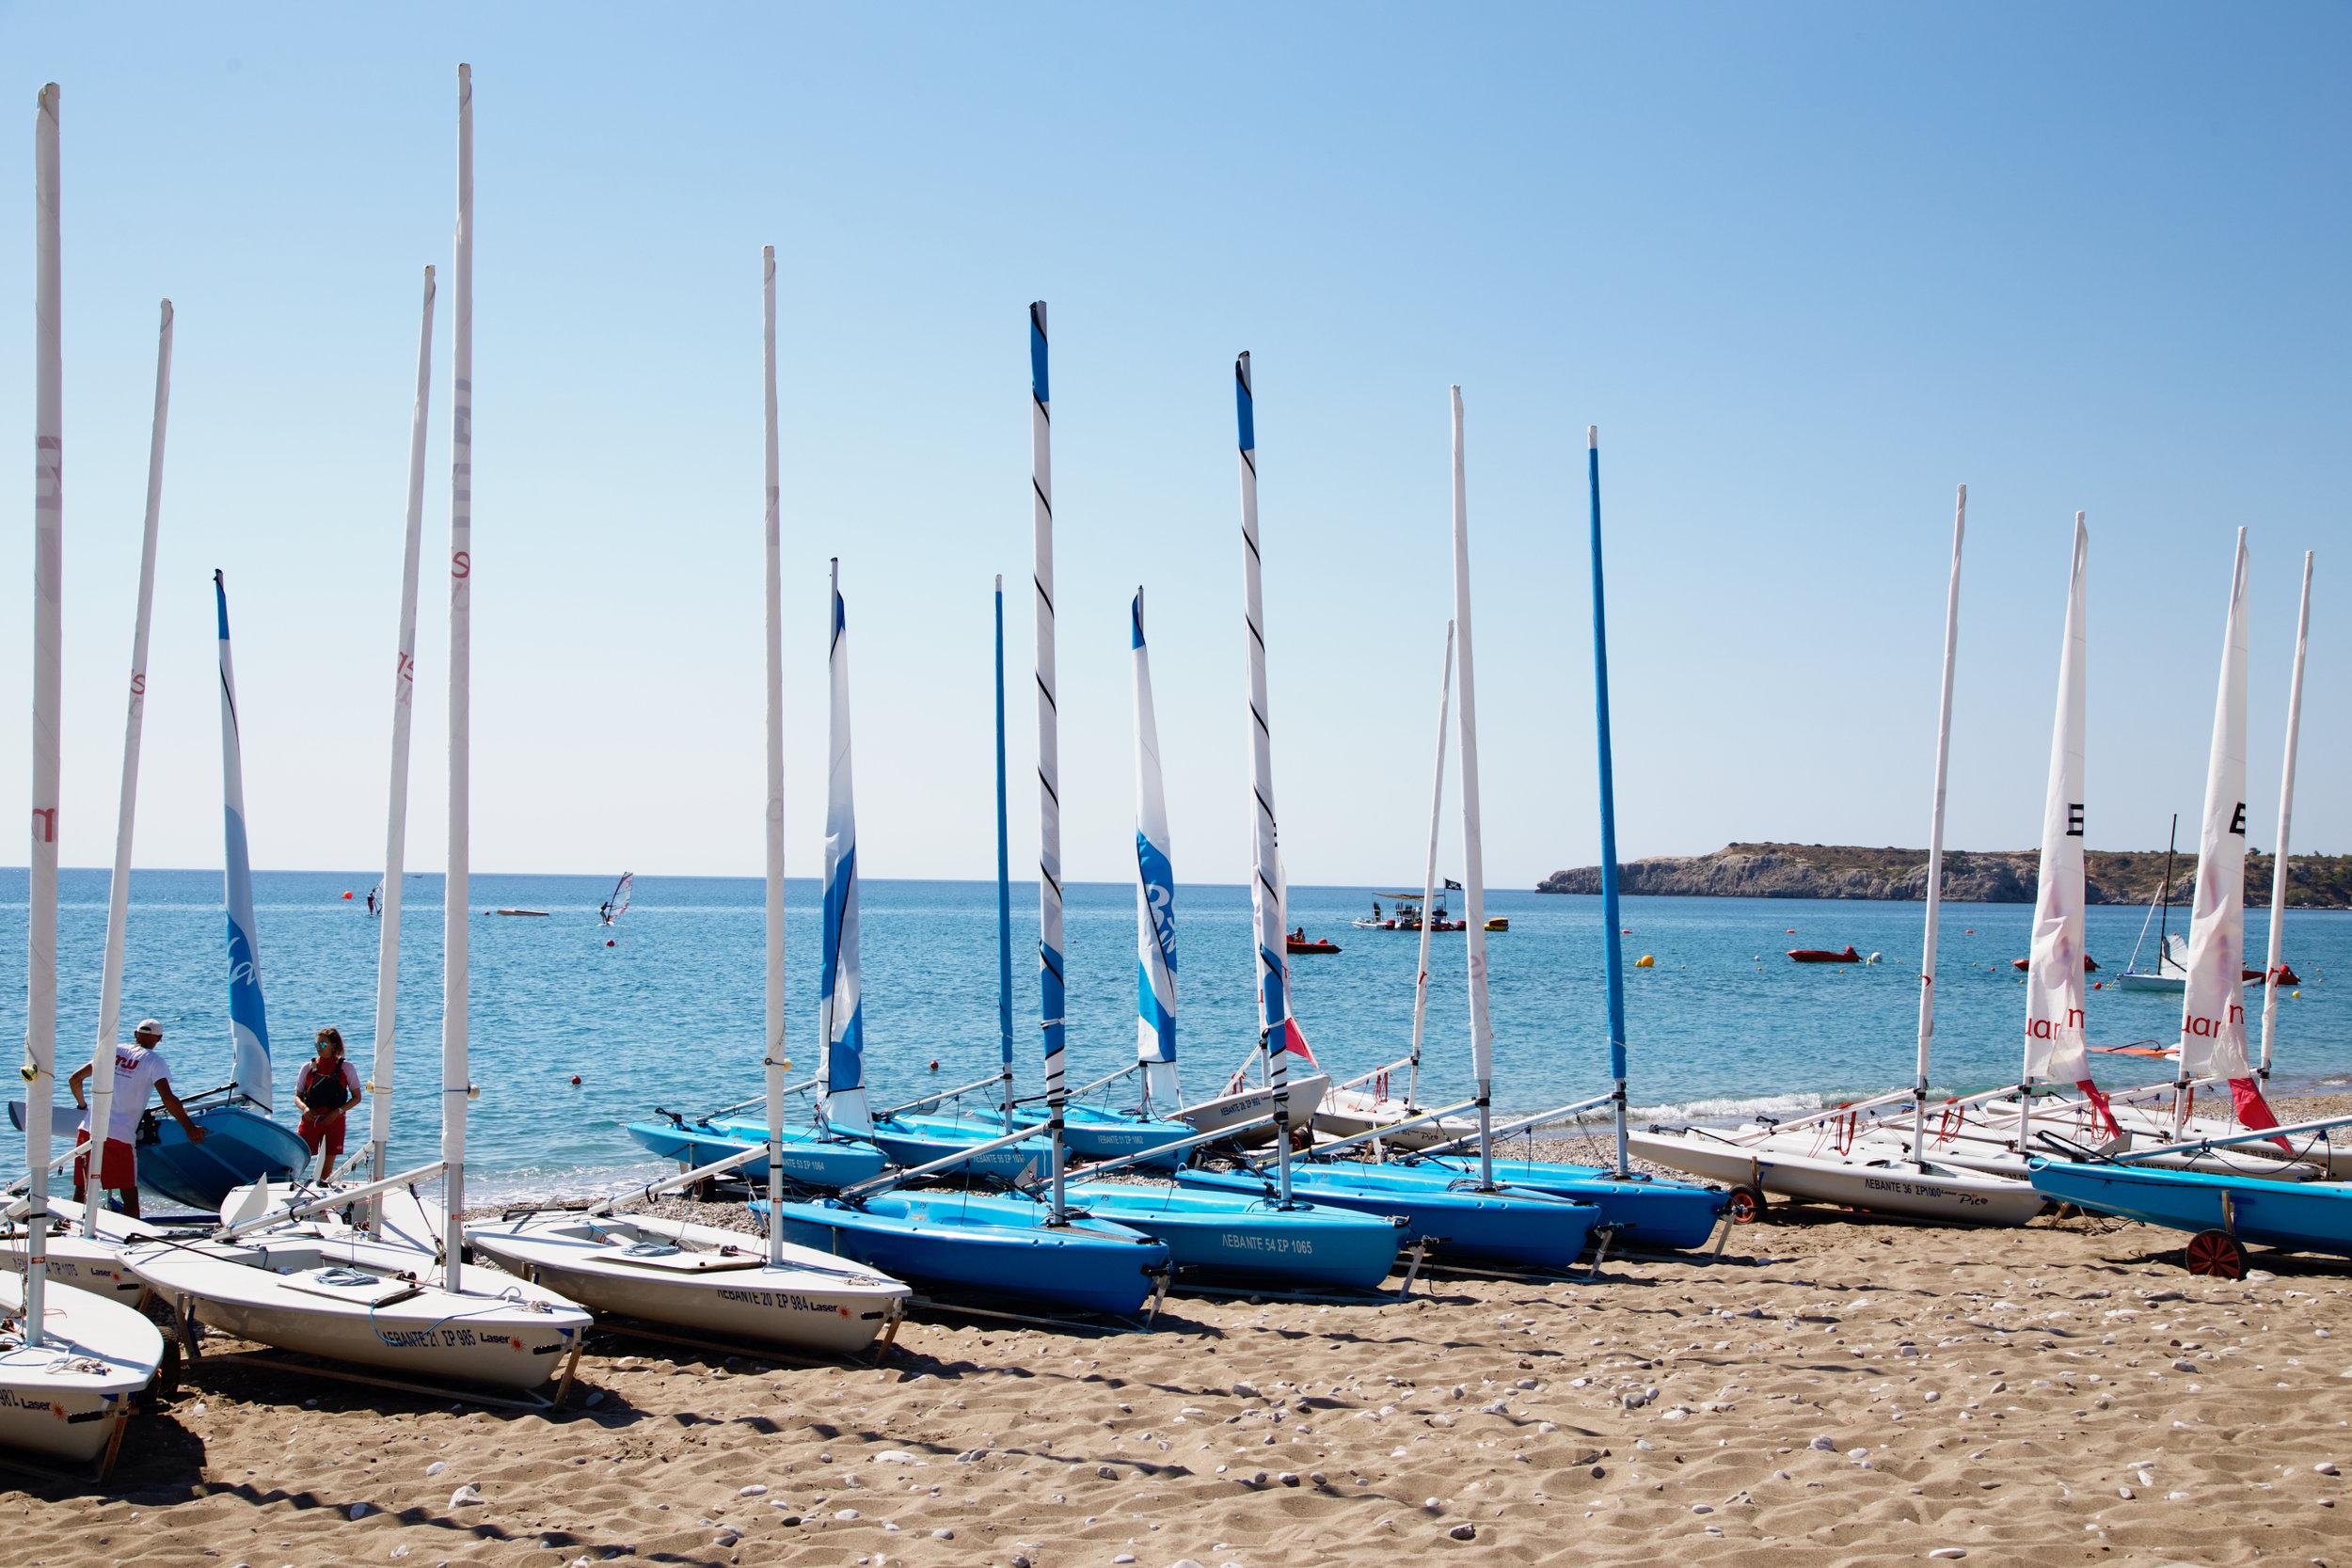 mark warner levante beach resort 16.jpg